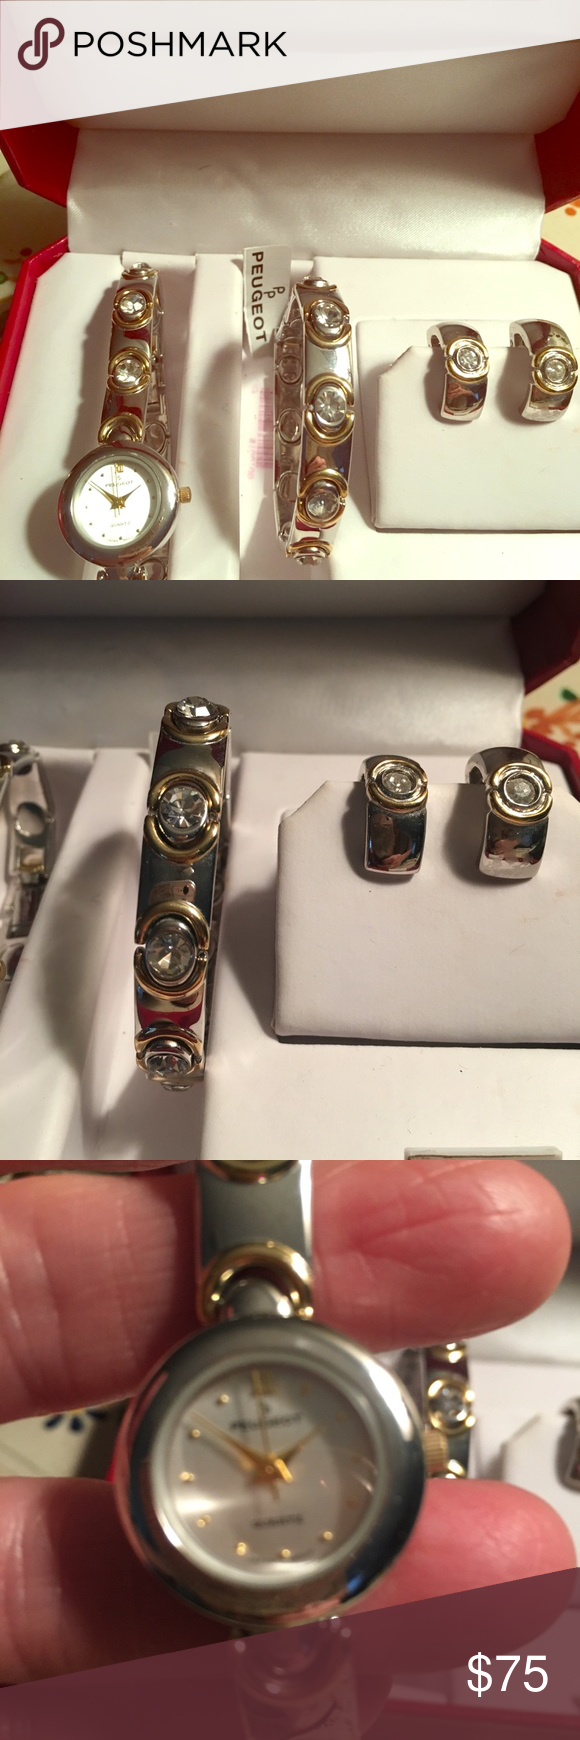 Peugeot Watch Jewelry Set Nwt Stainless Steel Peugeot Watch Bracelet Earring Gift Set Brand New Makes A Gre Earring Gift Set Jewelry Set Watches Jewelry